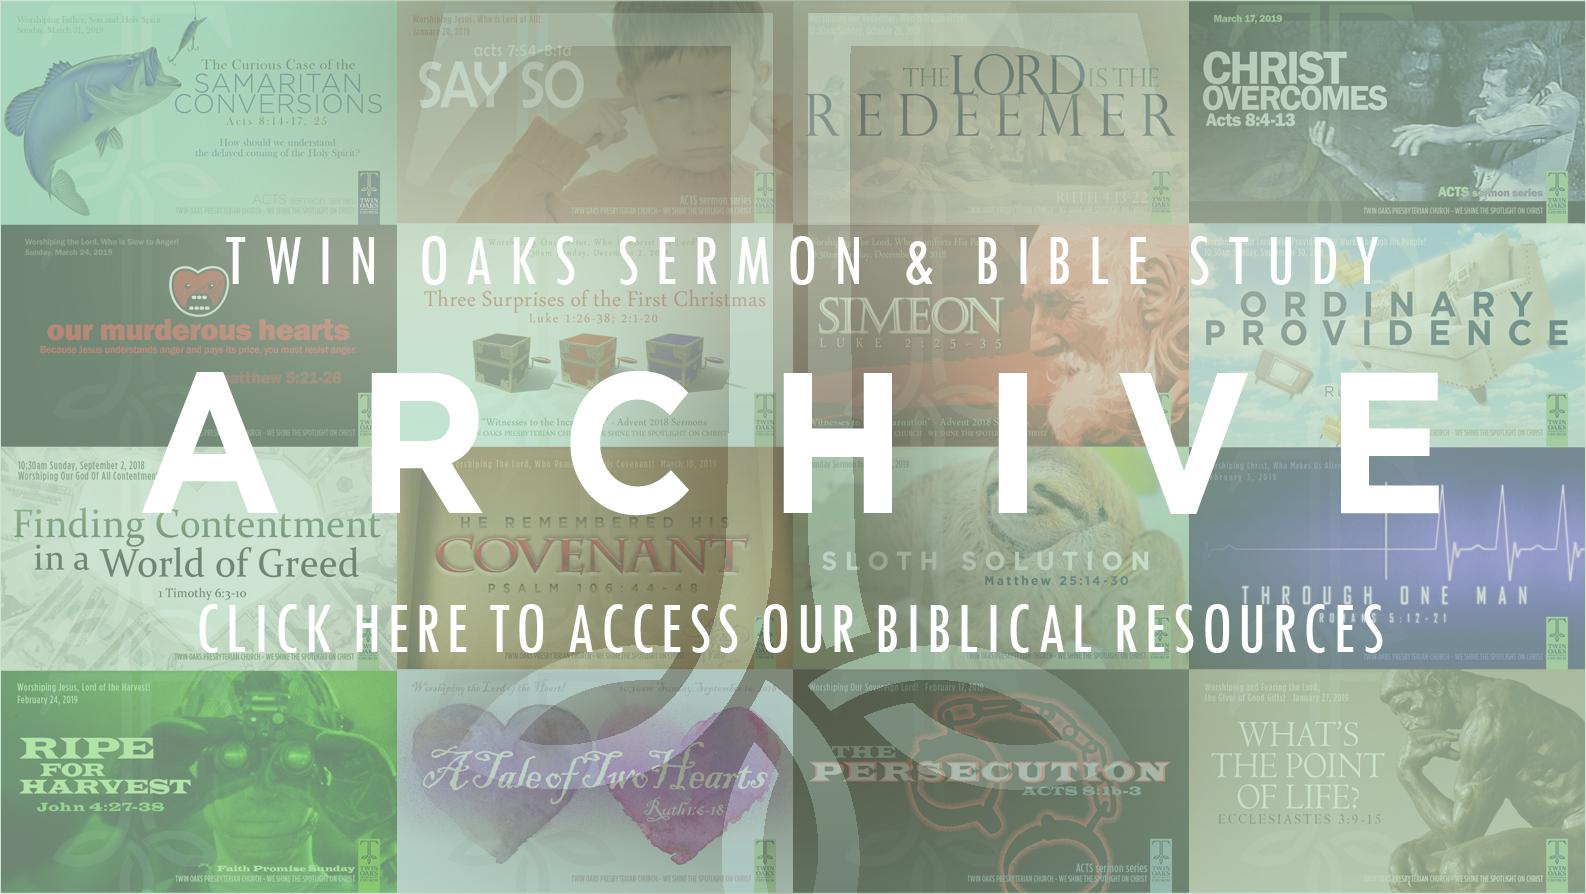 Sermon archive image new.jpg